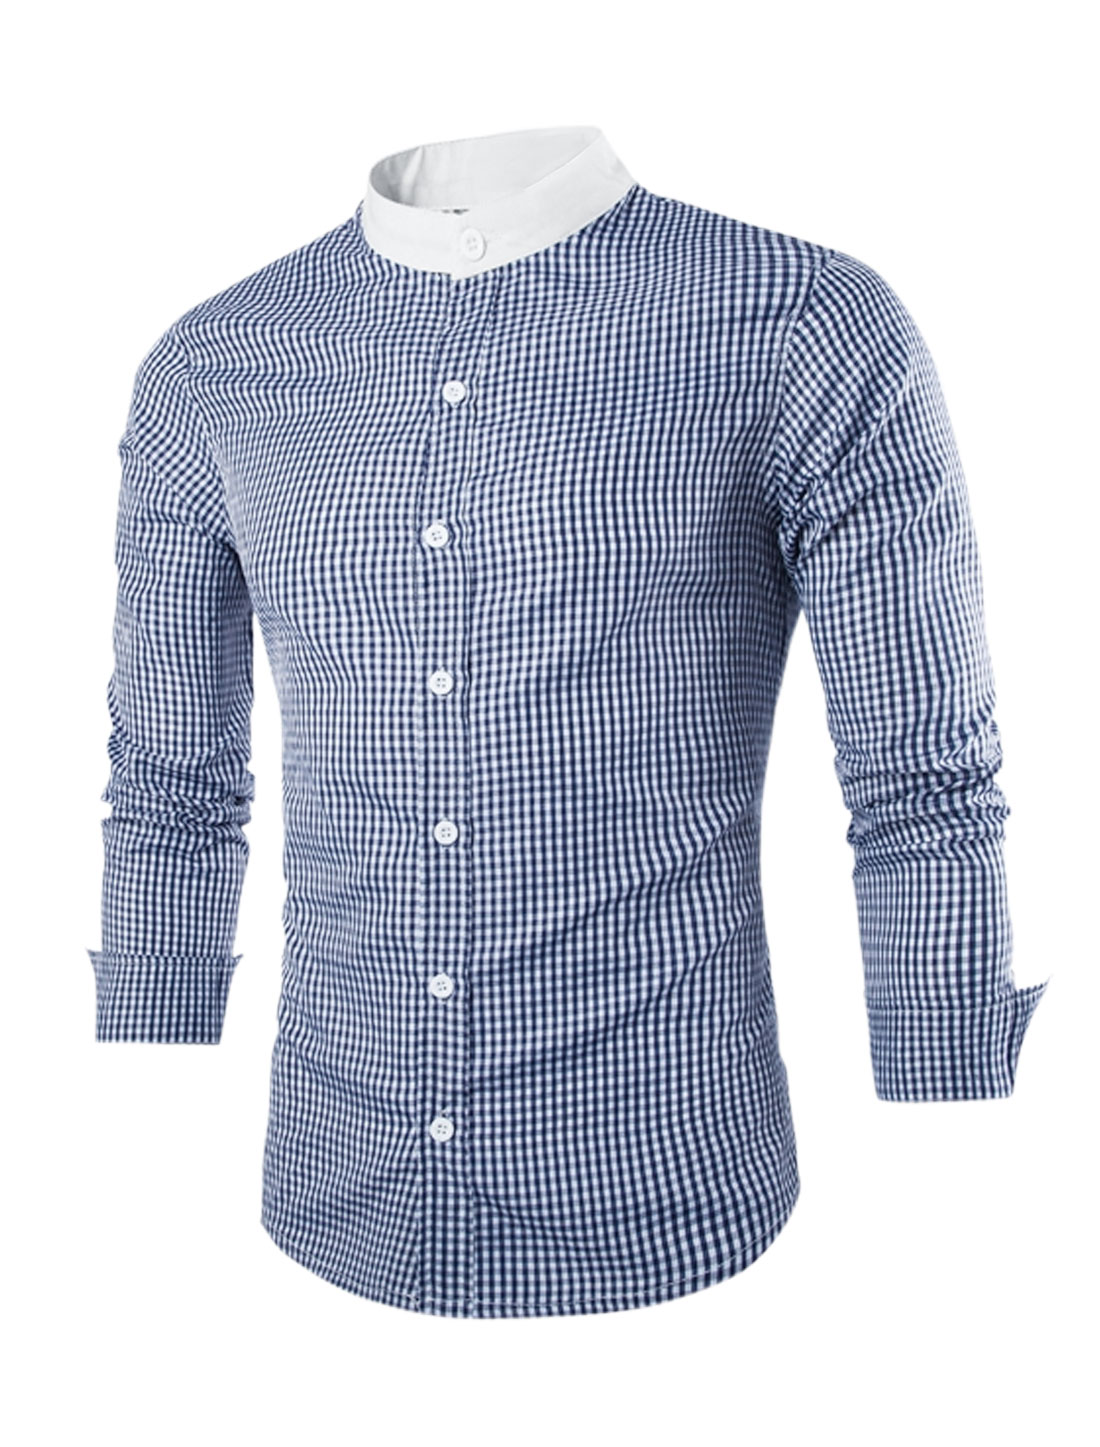 Men Long Sleeve Stand Collar Button Down Slim Fit Plaids Shirt Blue M